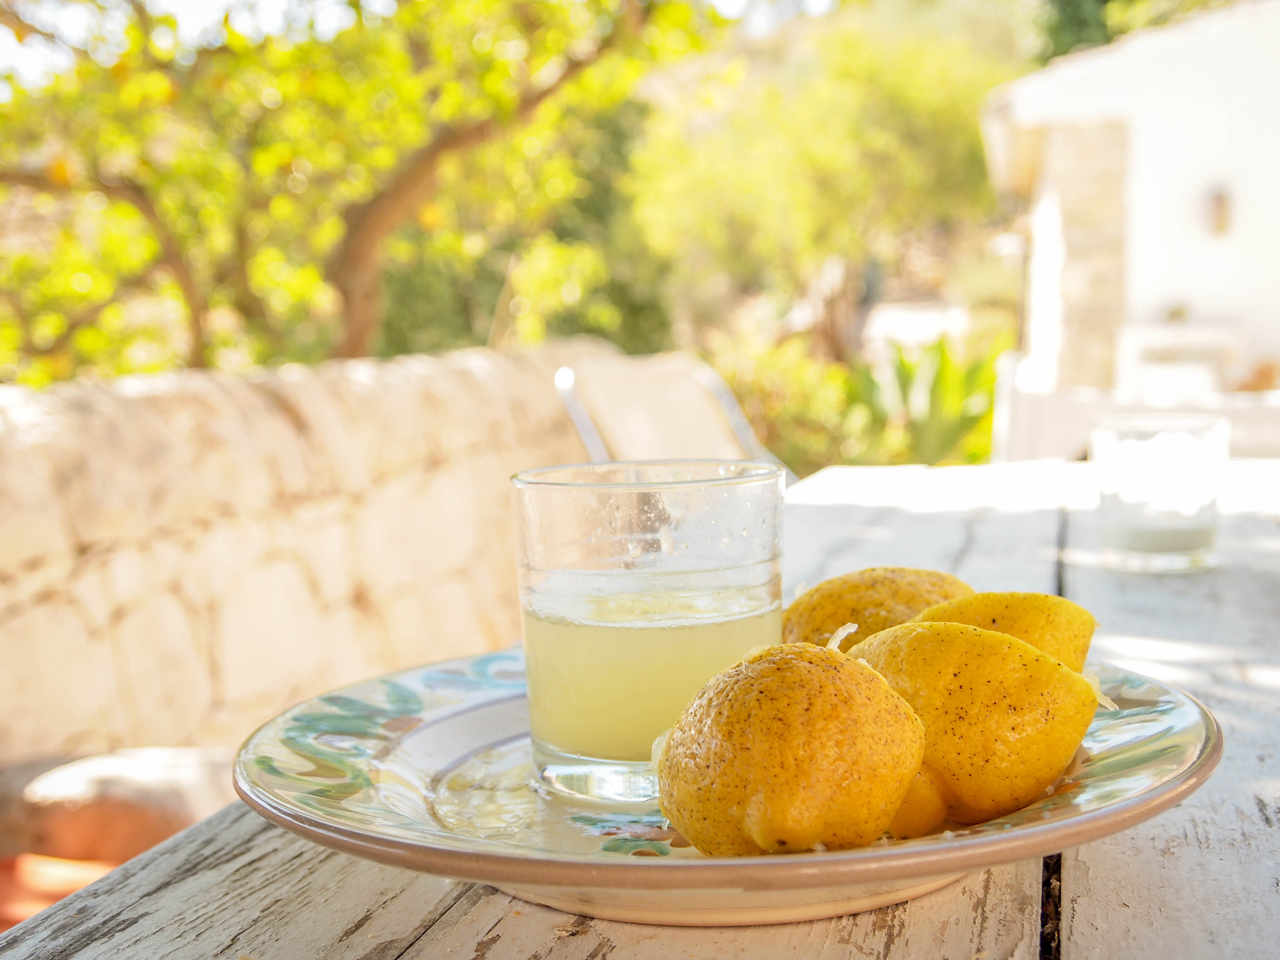 Freshly pressed lemon juice on our lovely terrace in Modica